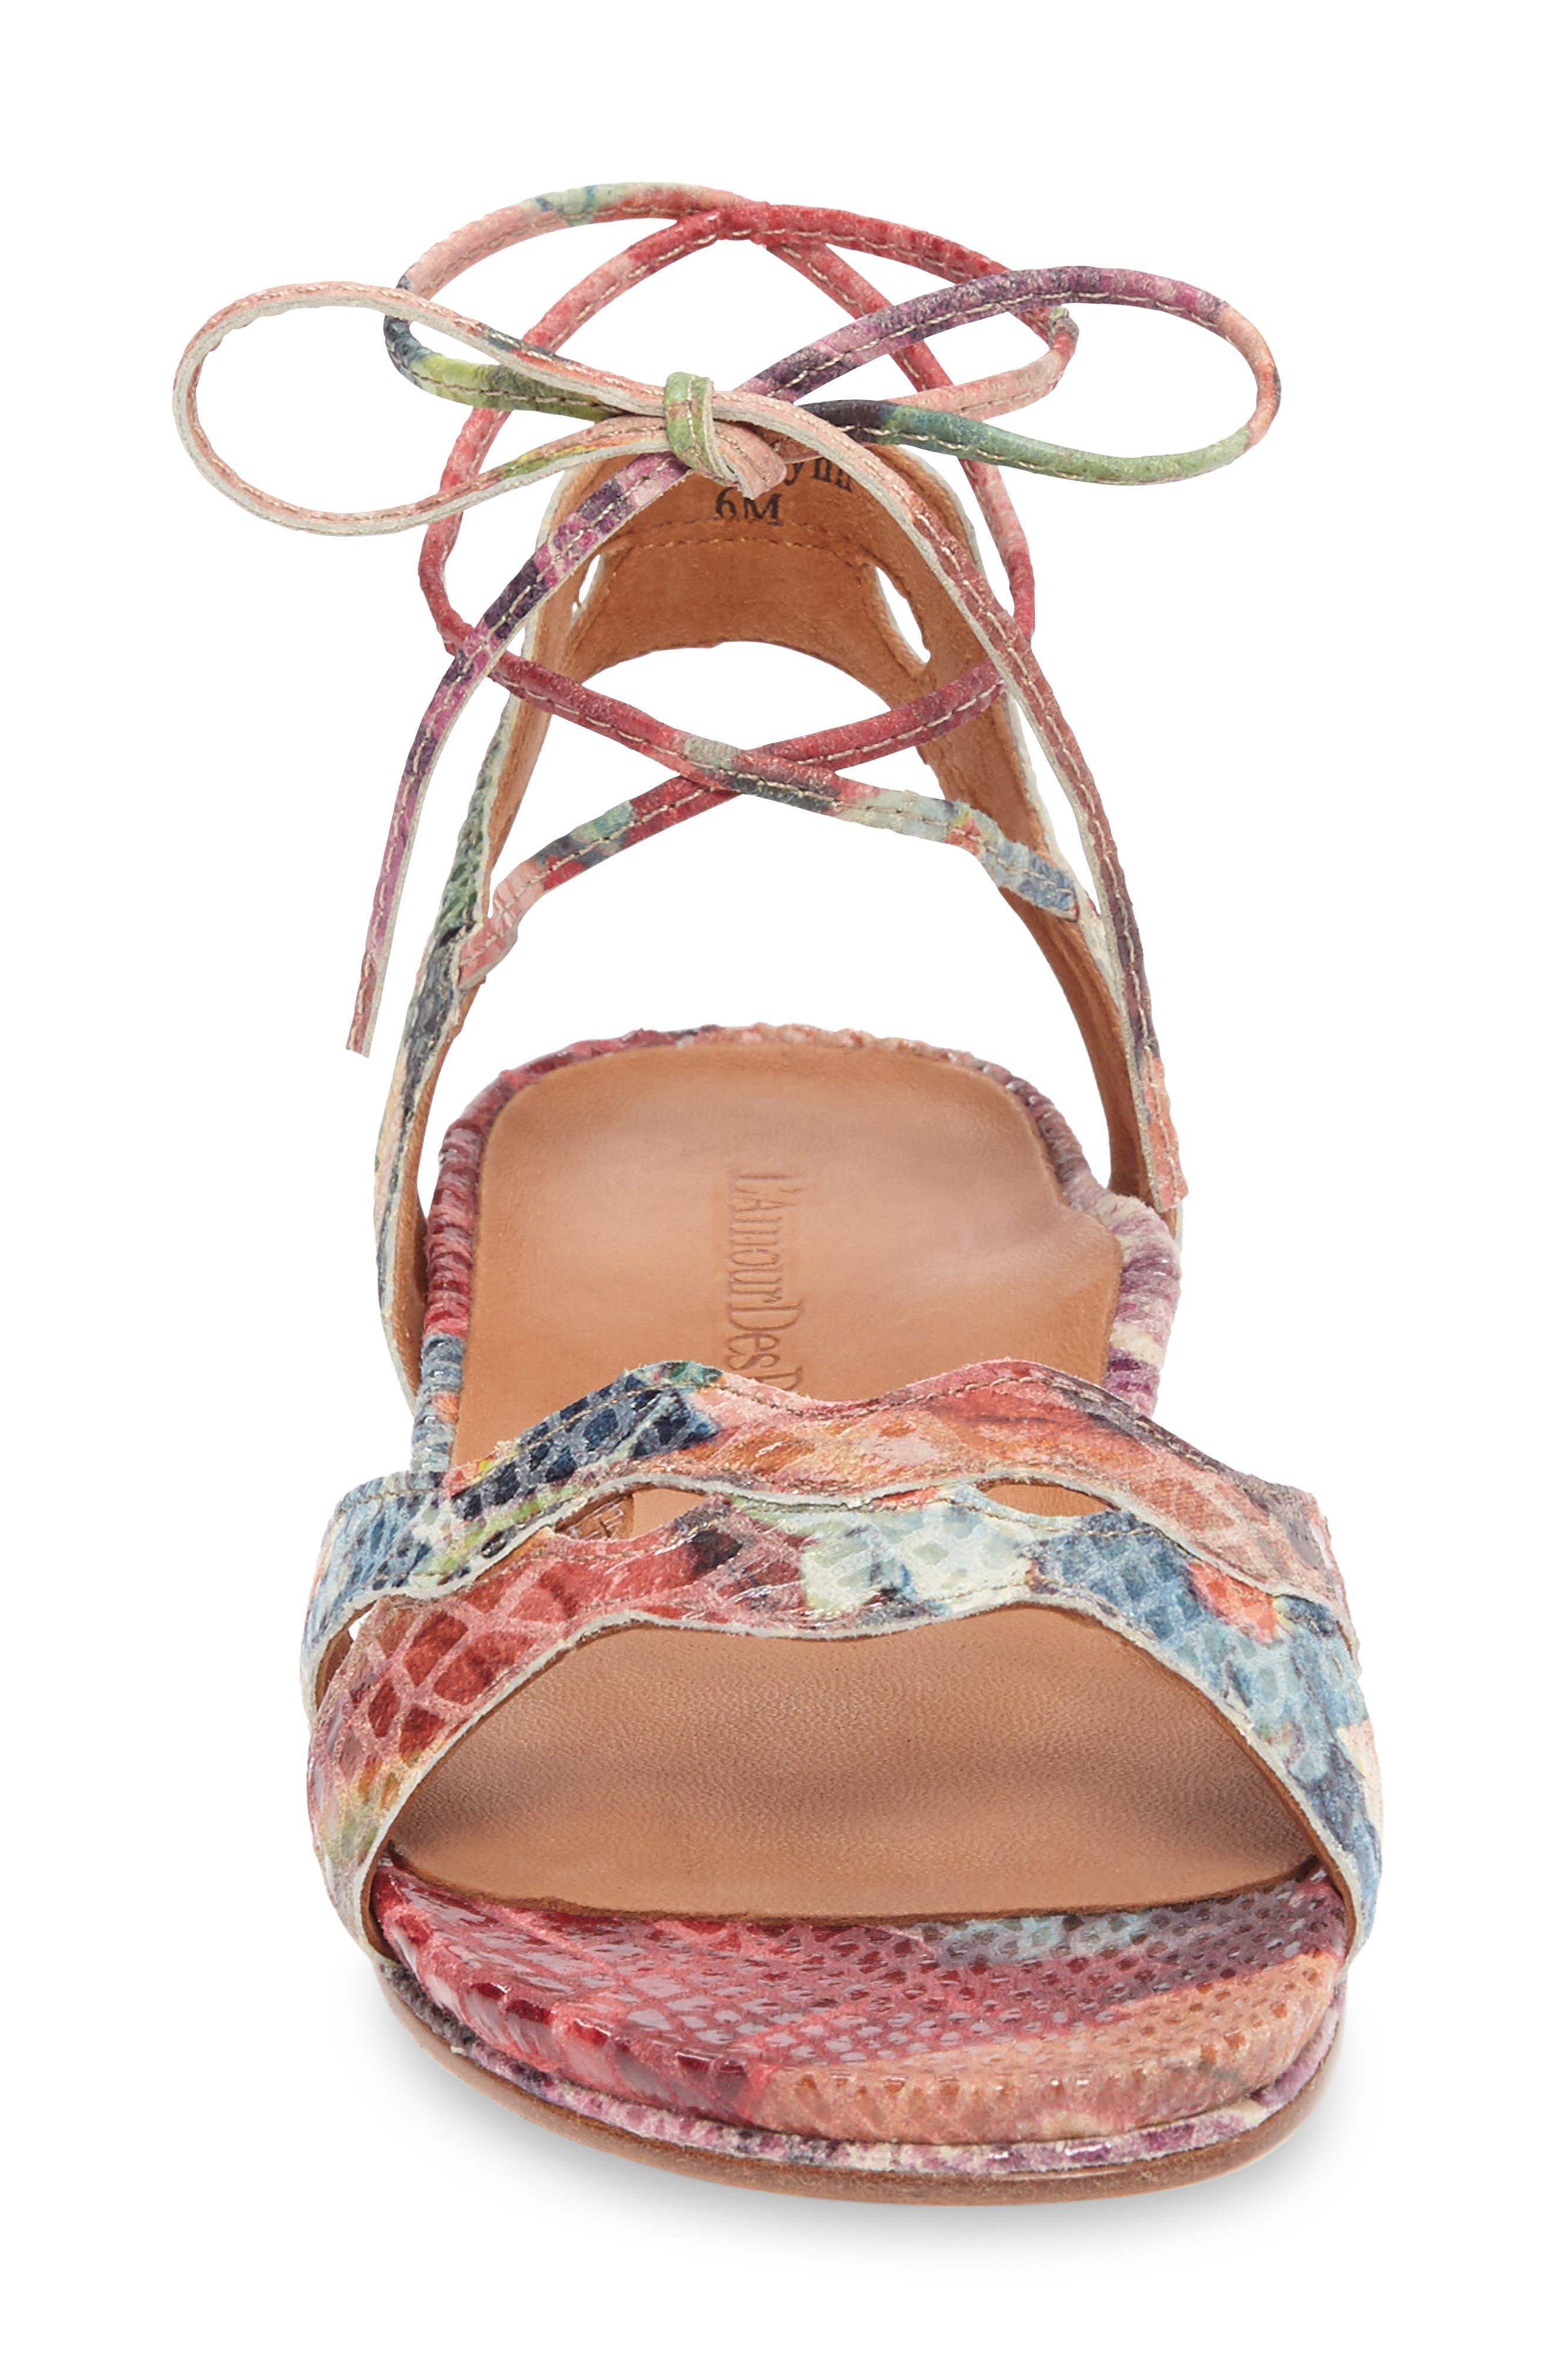 Darrylynn Wraparound Lace-Up Sandal,                             Alternate thumbnail 6, color,